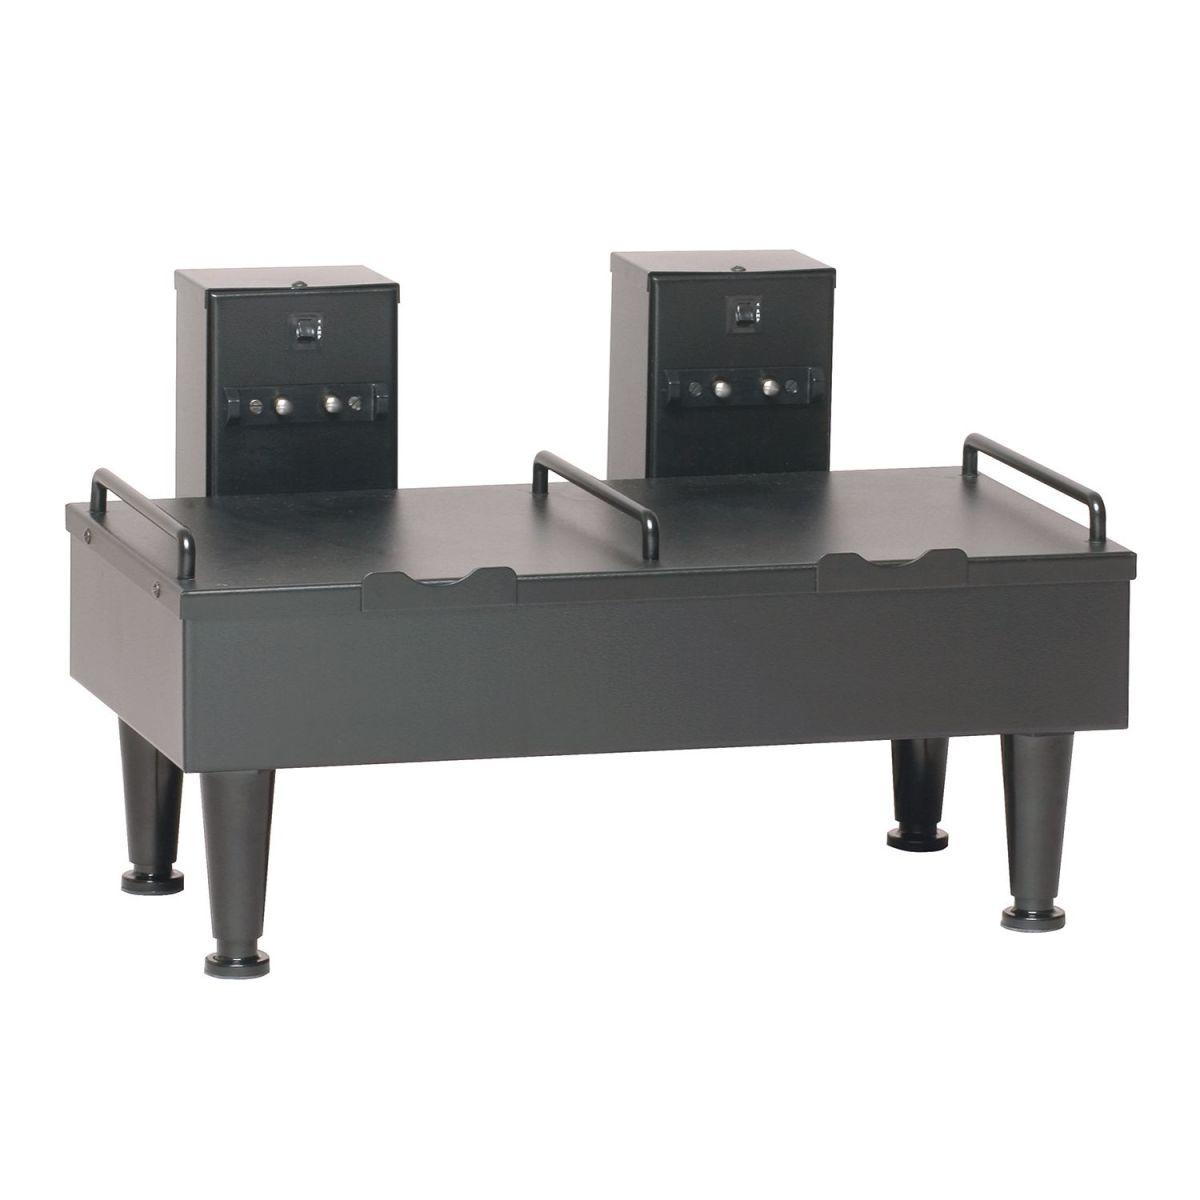 2SH Soft Heat Stand, Black